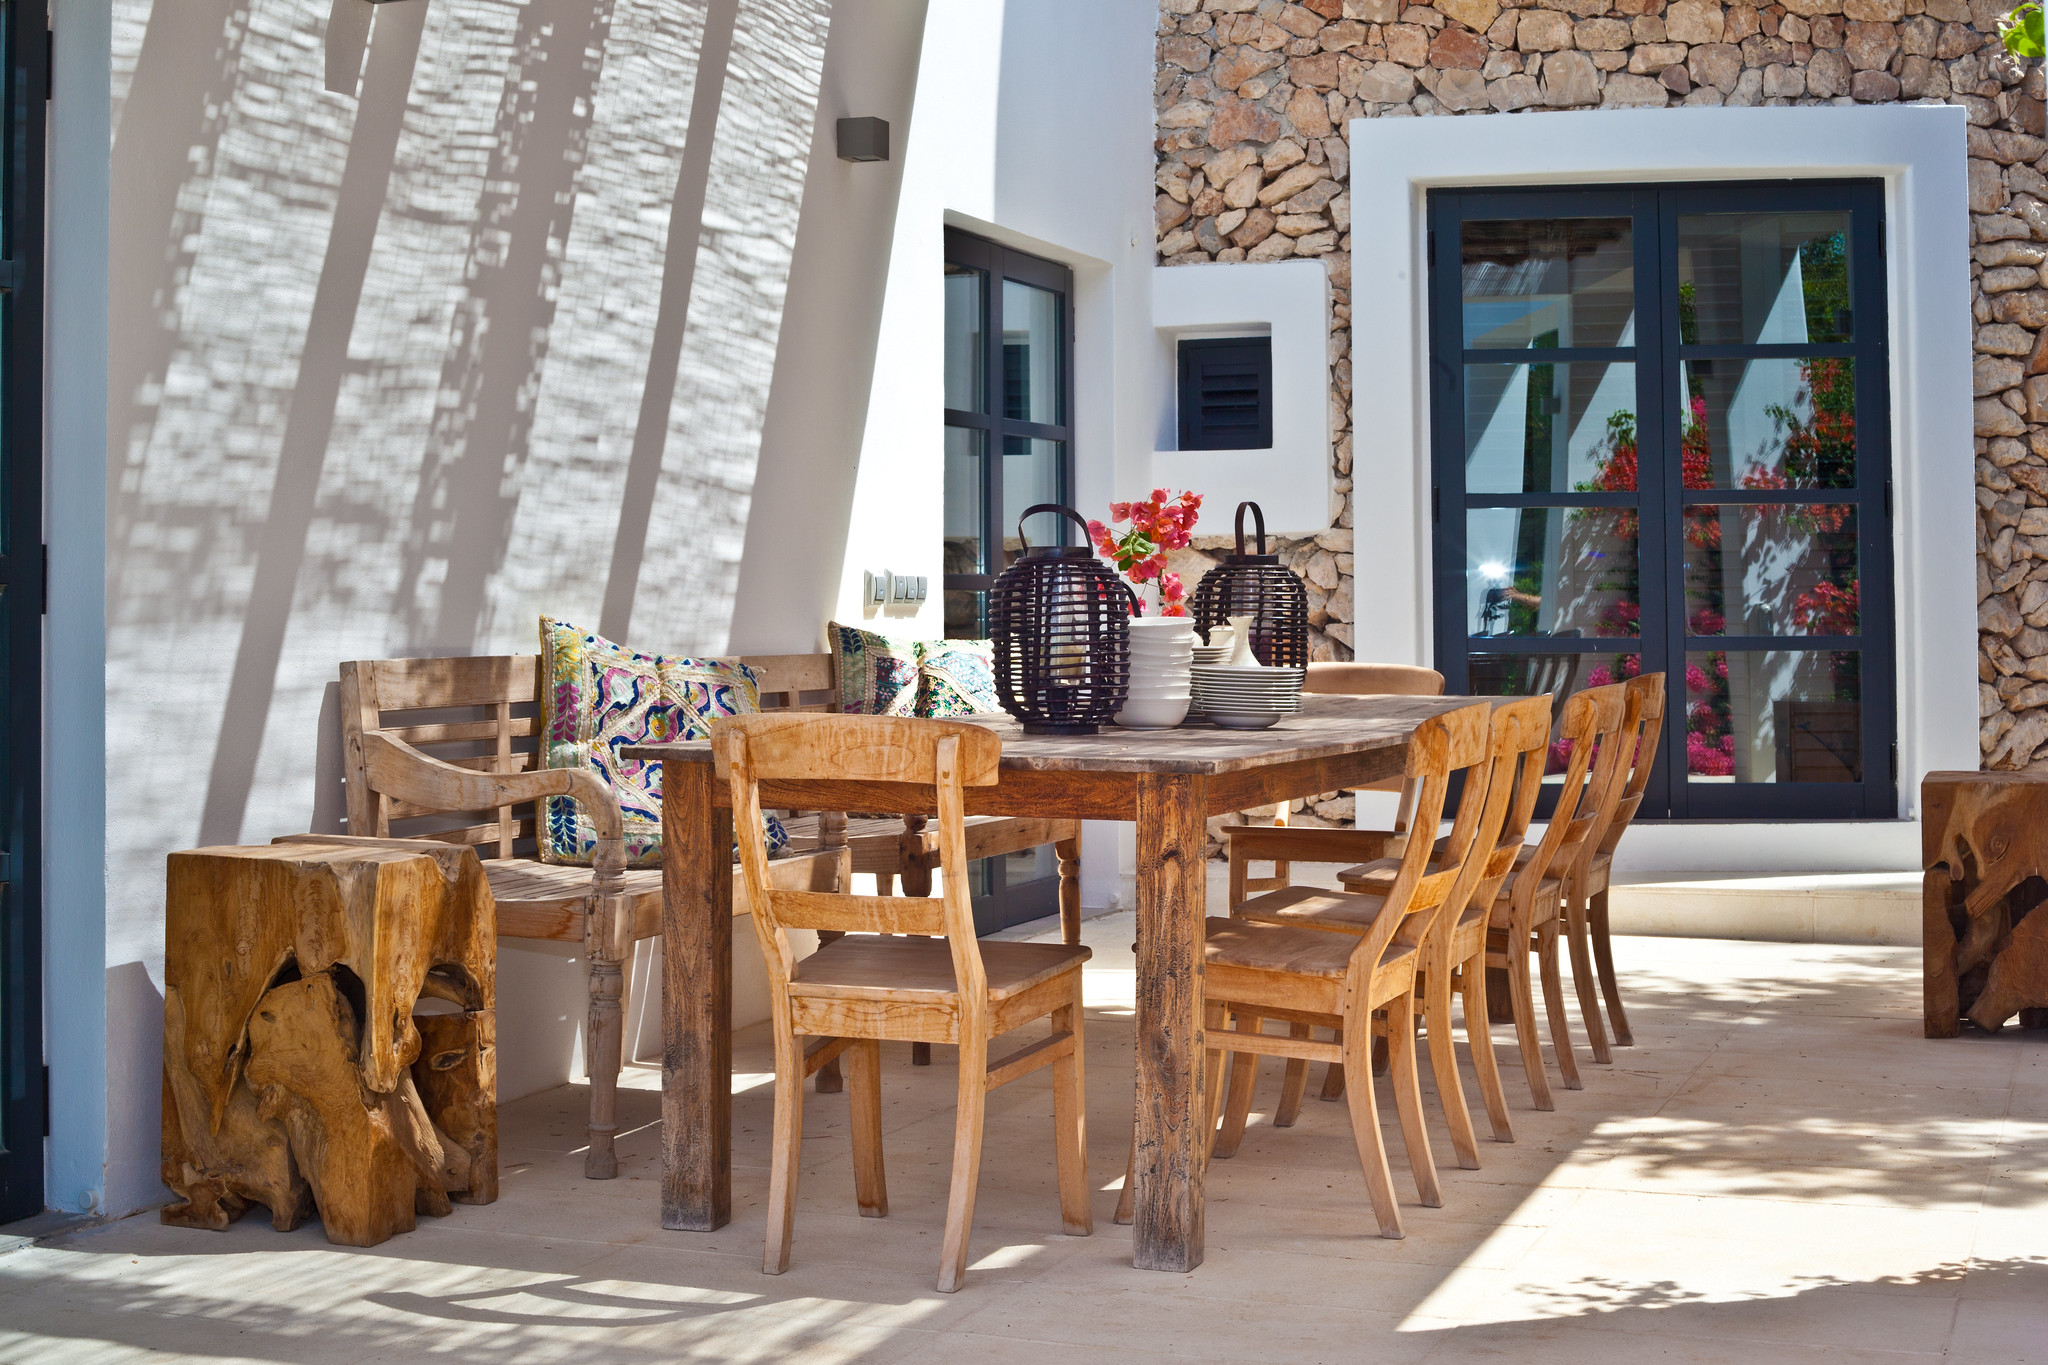 https://www.white-ibiza.com/wp-content/uploads/2020/05/white-ibiza-villas-casa-amalia-exterior-dining.jpg